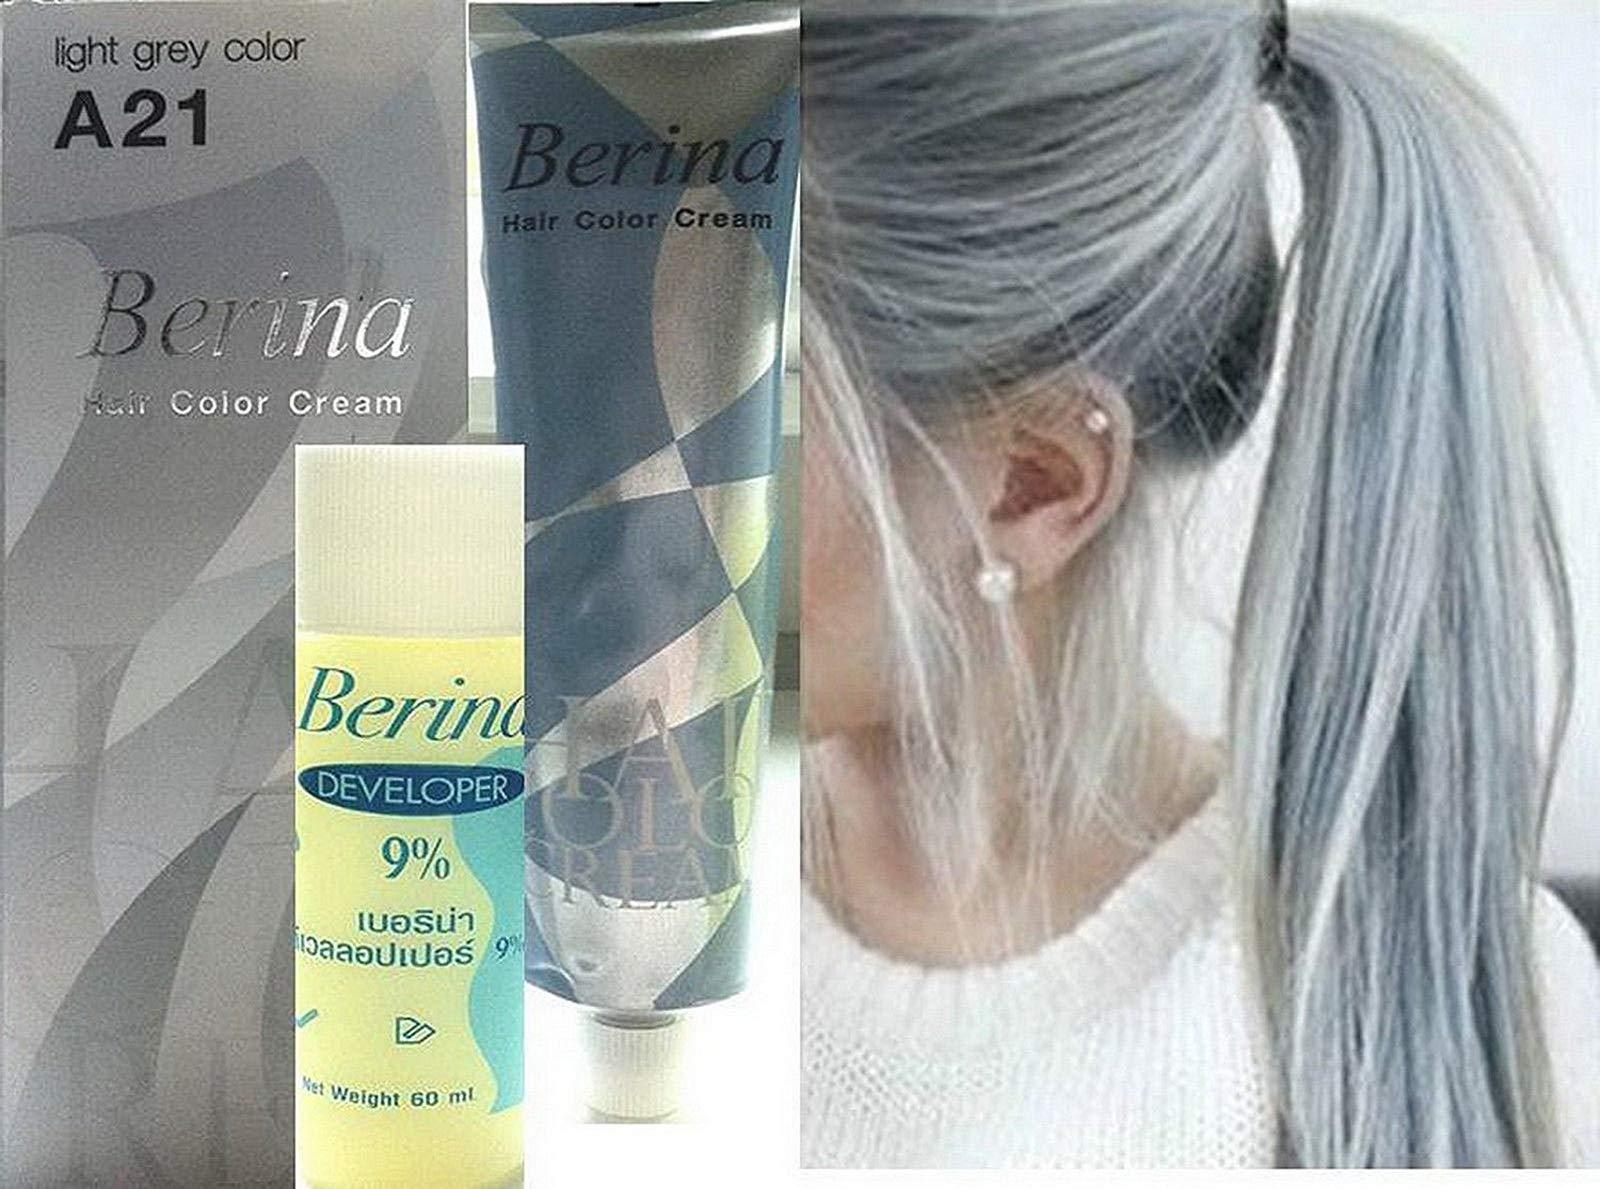 Hair Colour Permanent Hair Cream Dye Light Grey by Berina